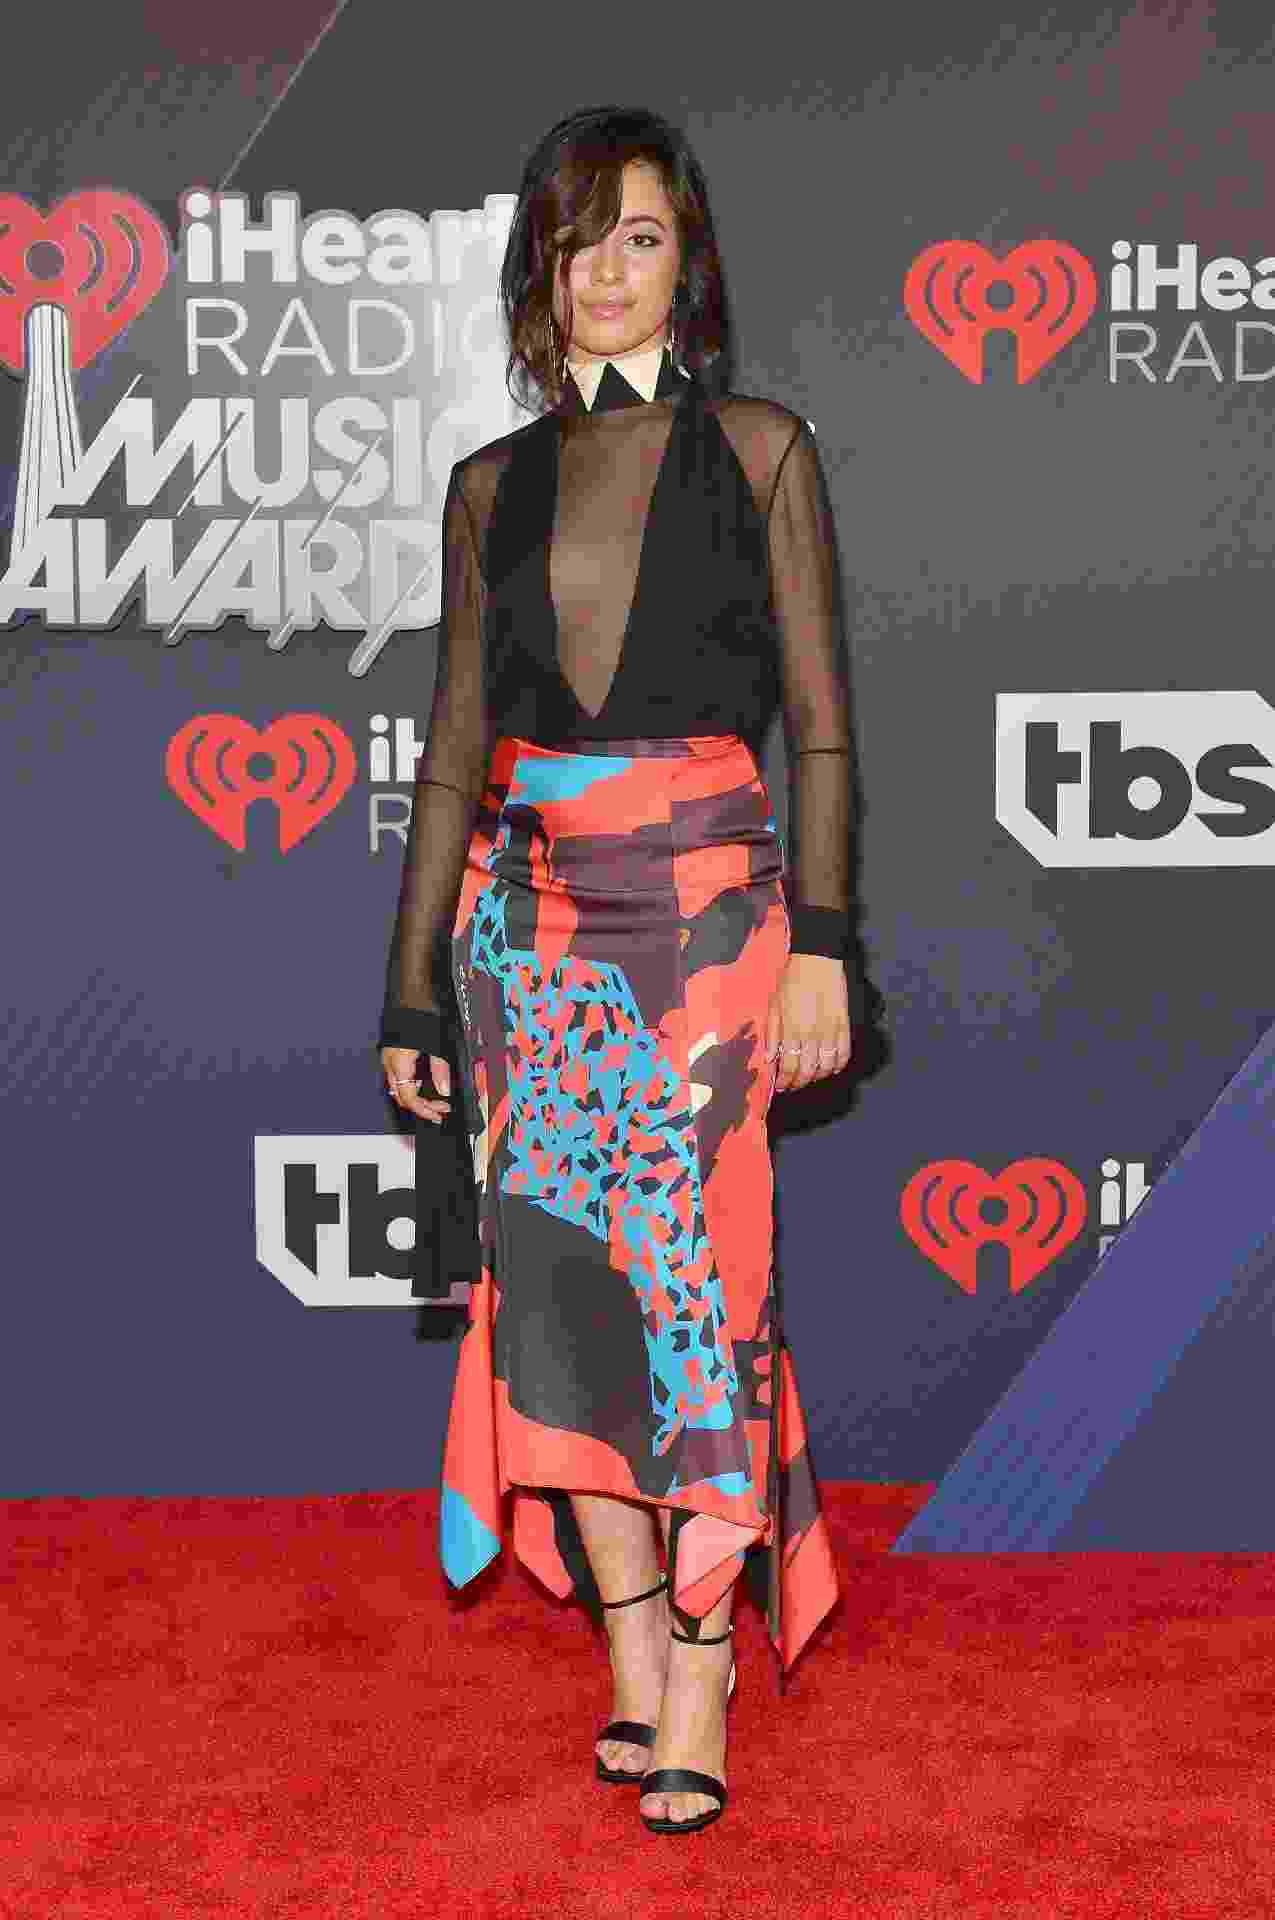 Camila Cabello - Getty Images